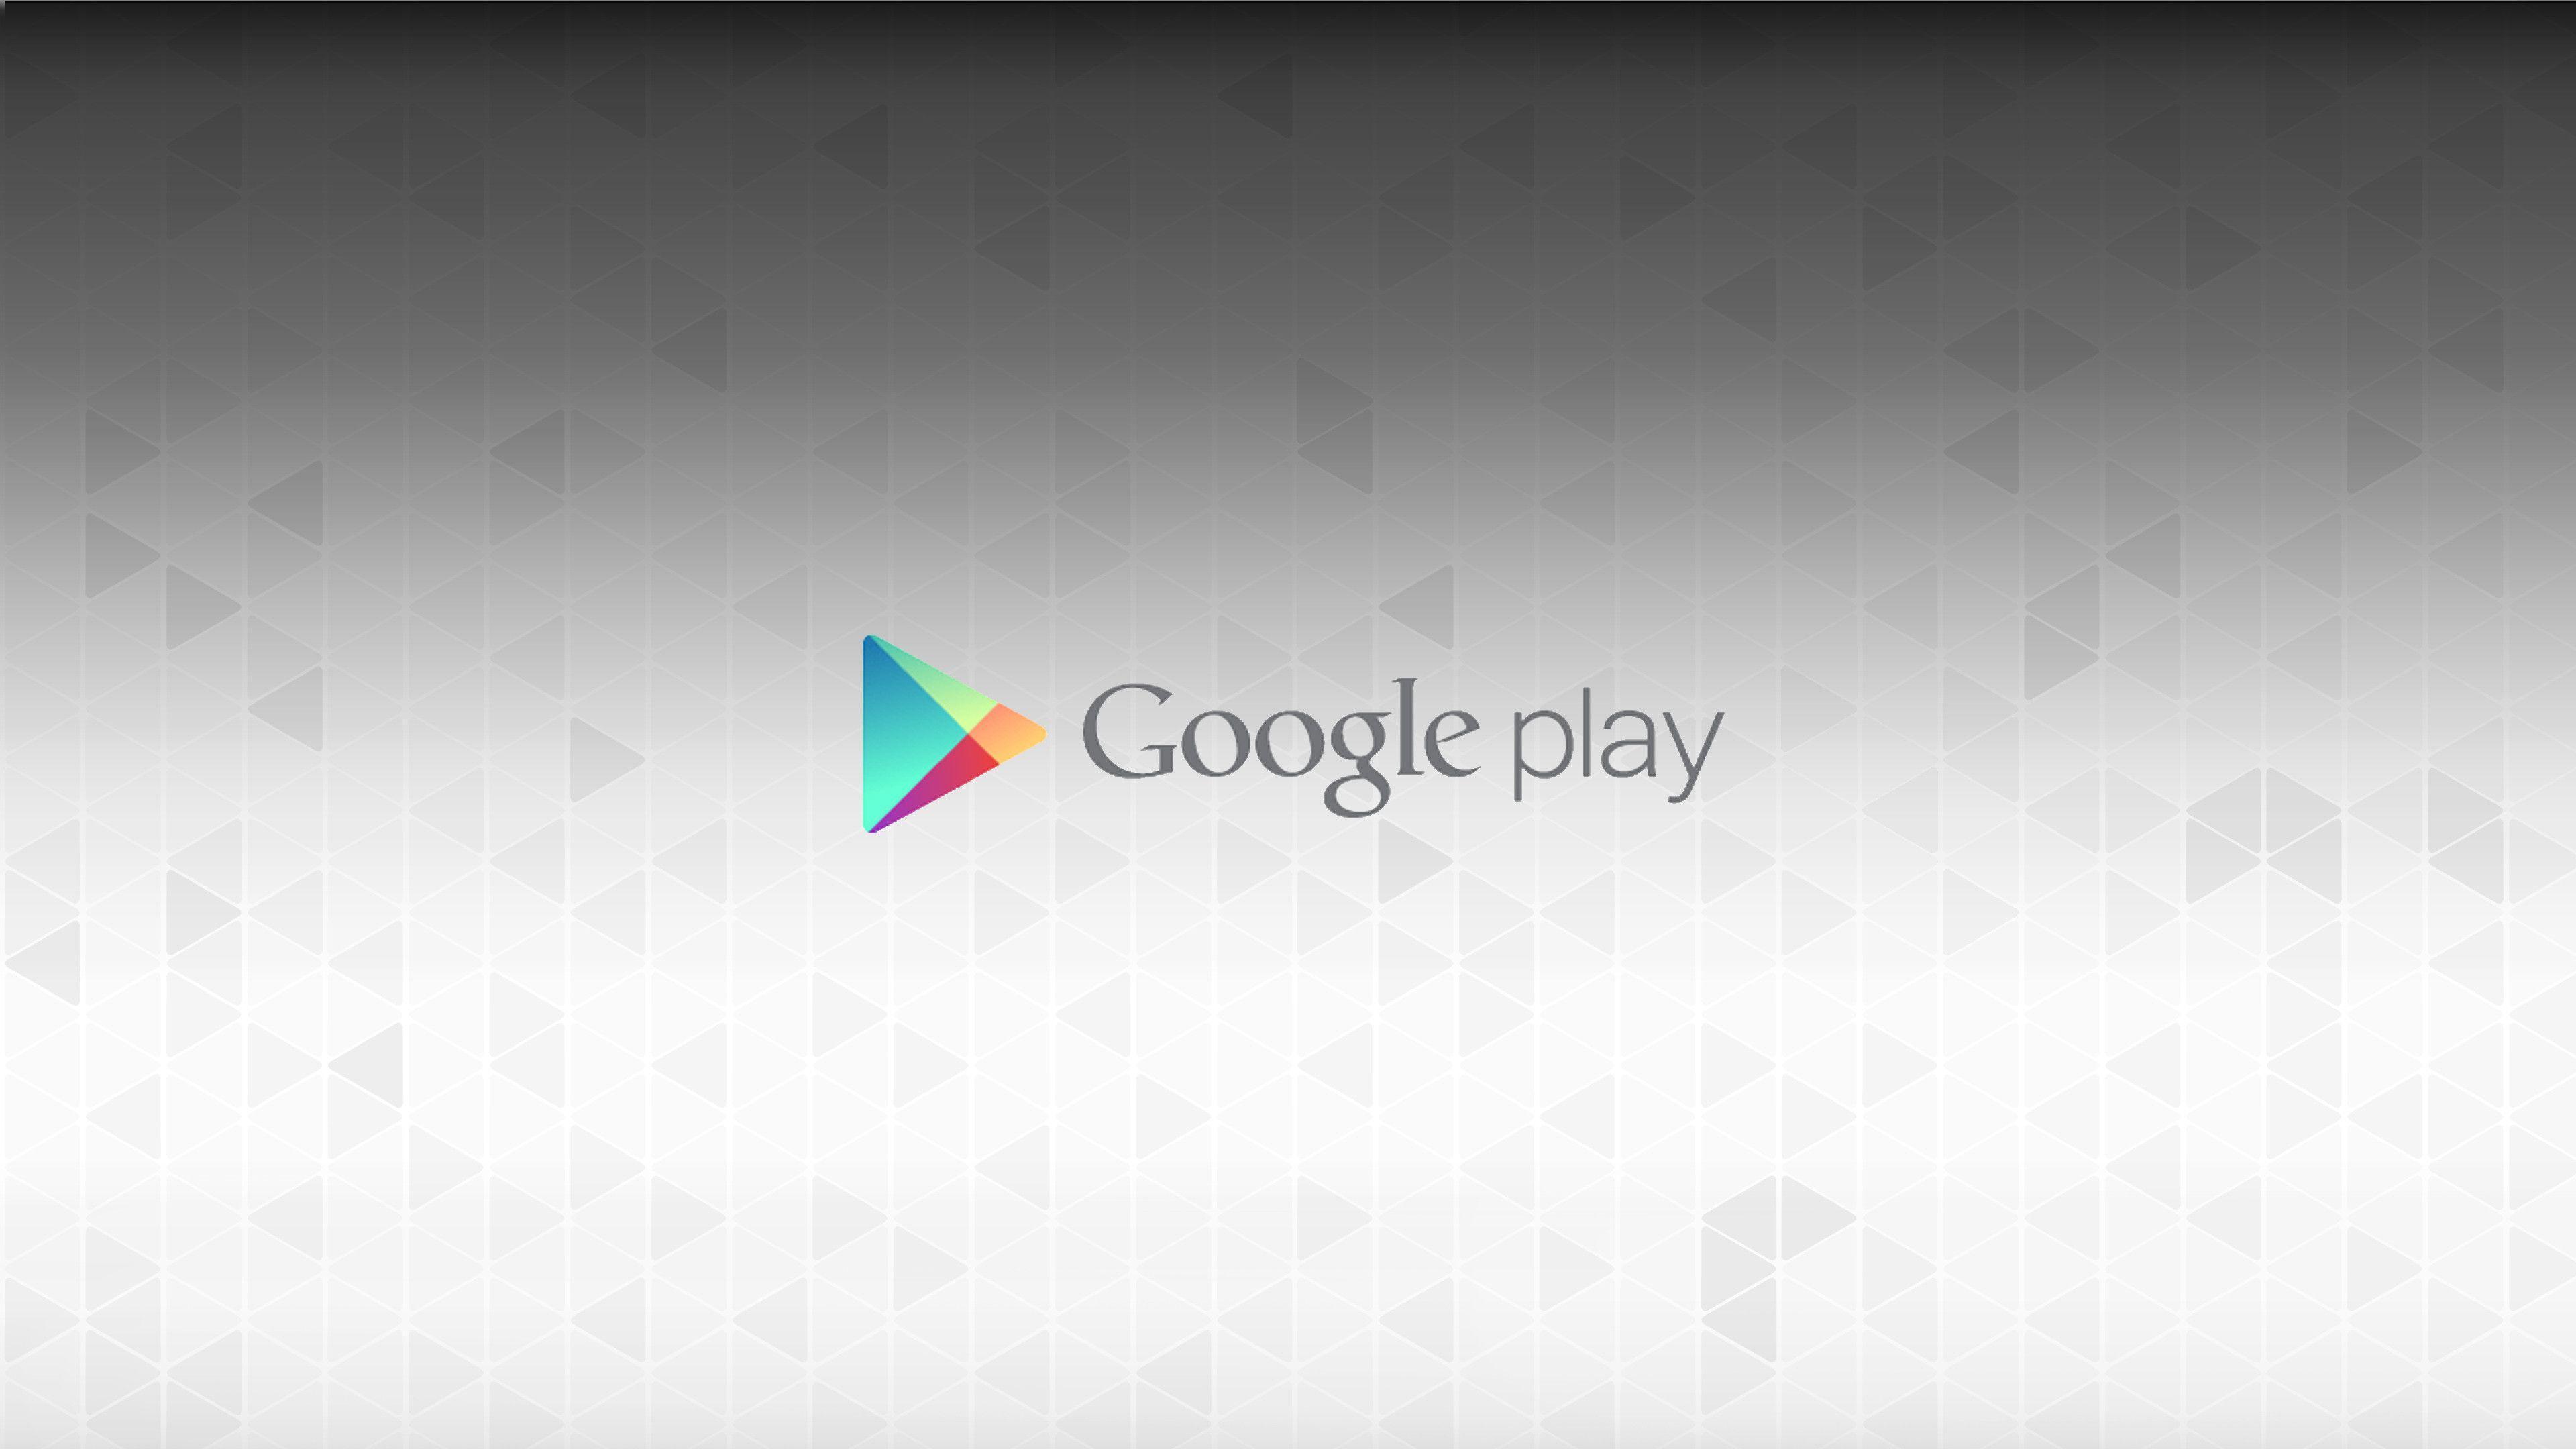 Google themes movies - Google Play Heartbeats Theme Song Movie Theme Songs Tv